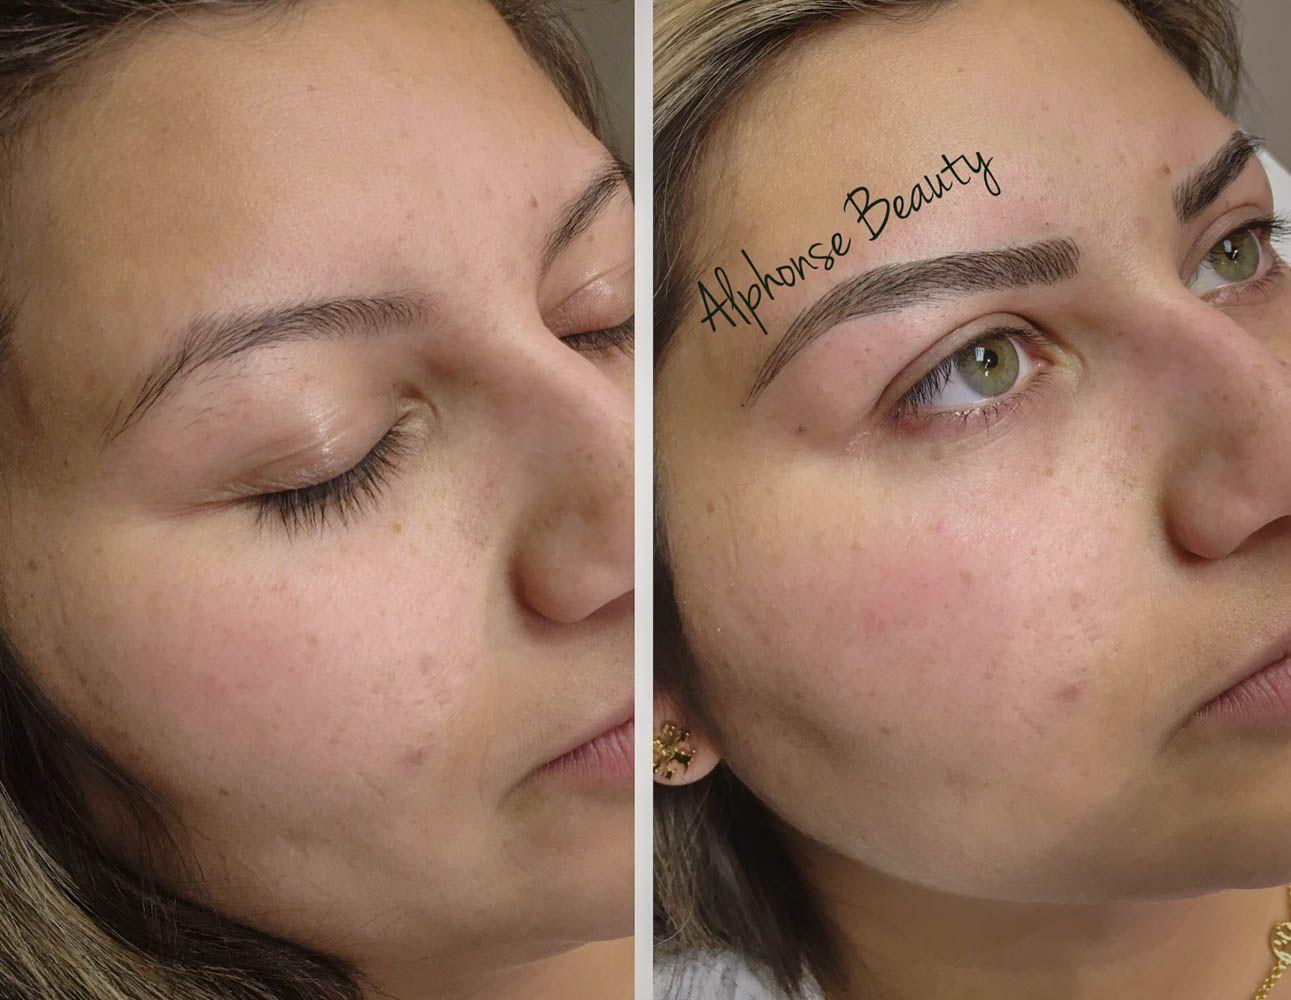 Permanent Makeup Eyebrow Microblading at Alphonse Beauty in Metro Detroit Michigan